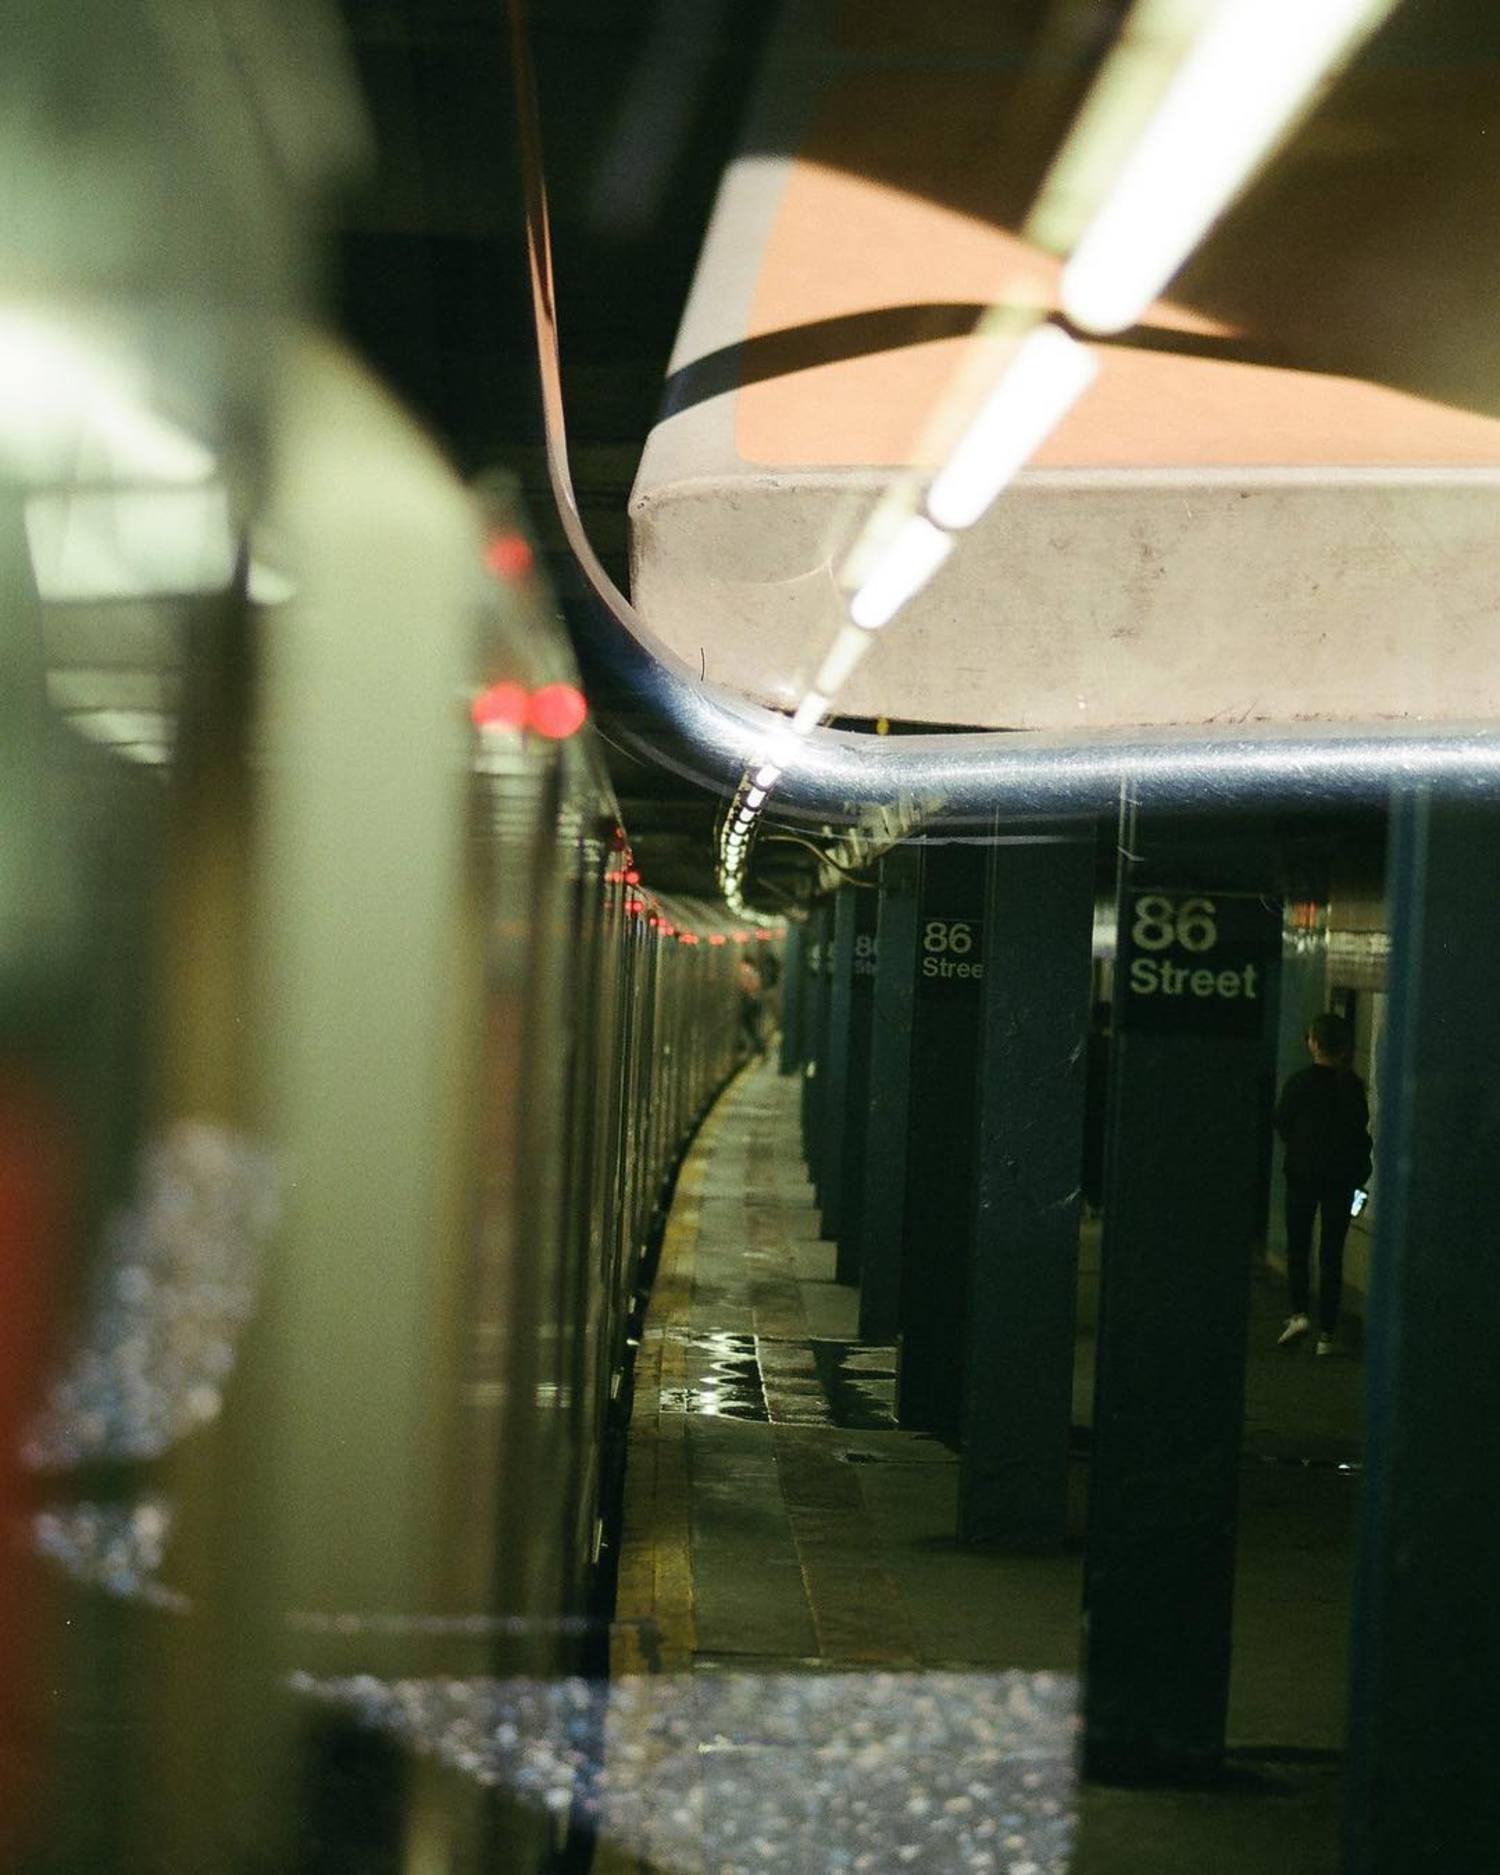 86th Street Station, New York